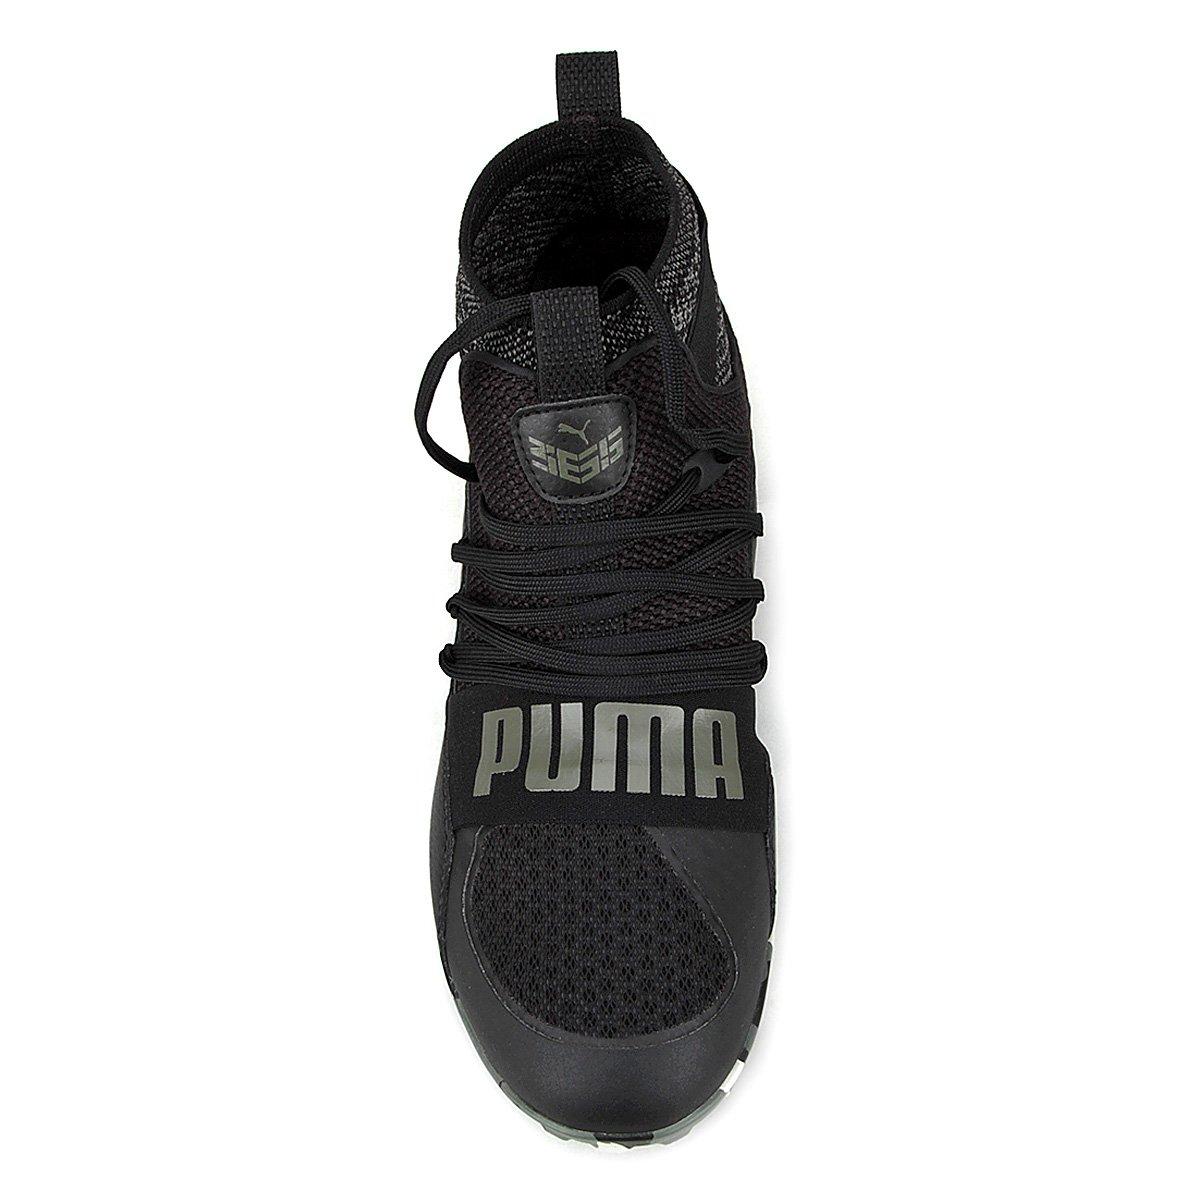 24b30bf0b6 Chuteira Society Puma 365.18 Ignite High Masculina - Compre Agora ...